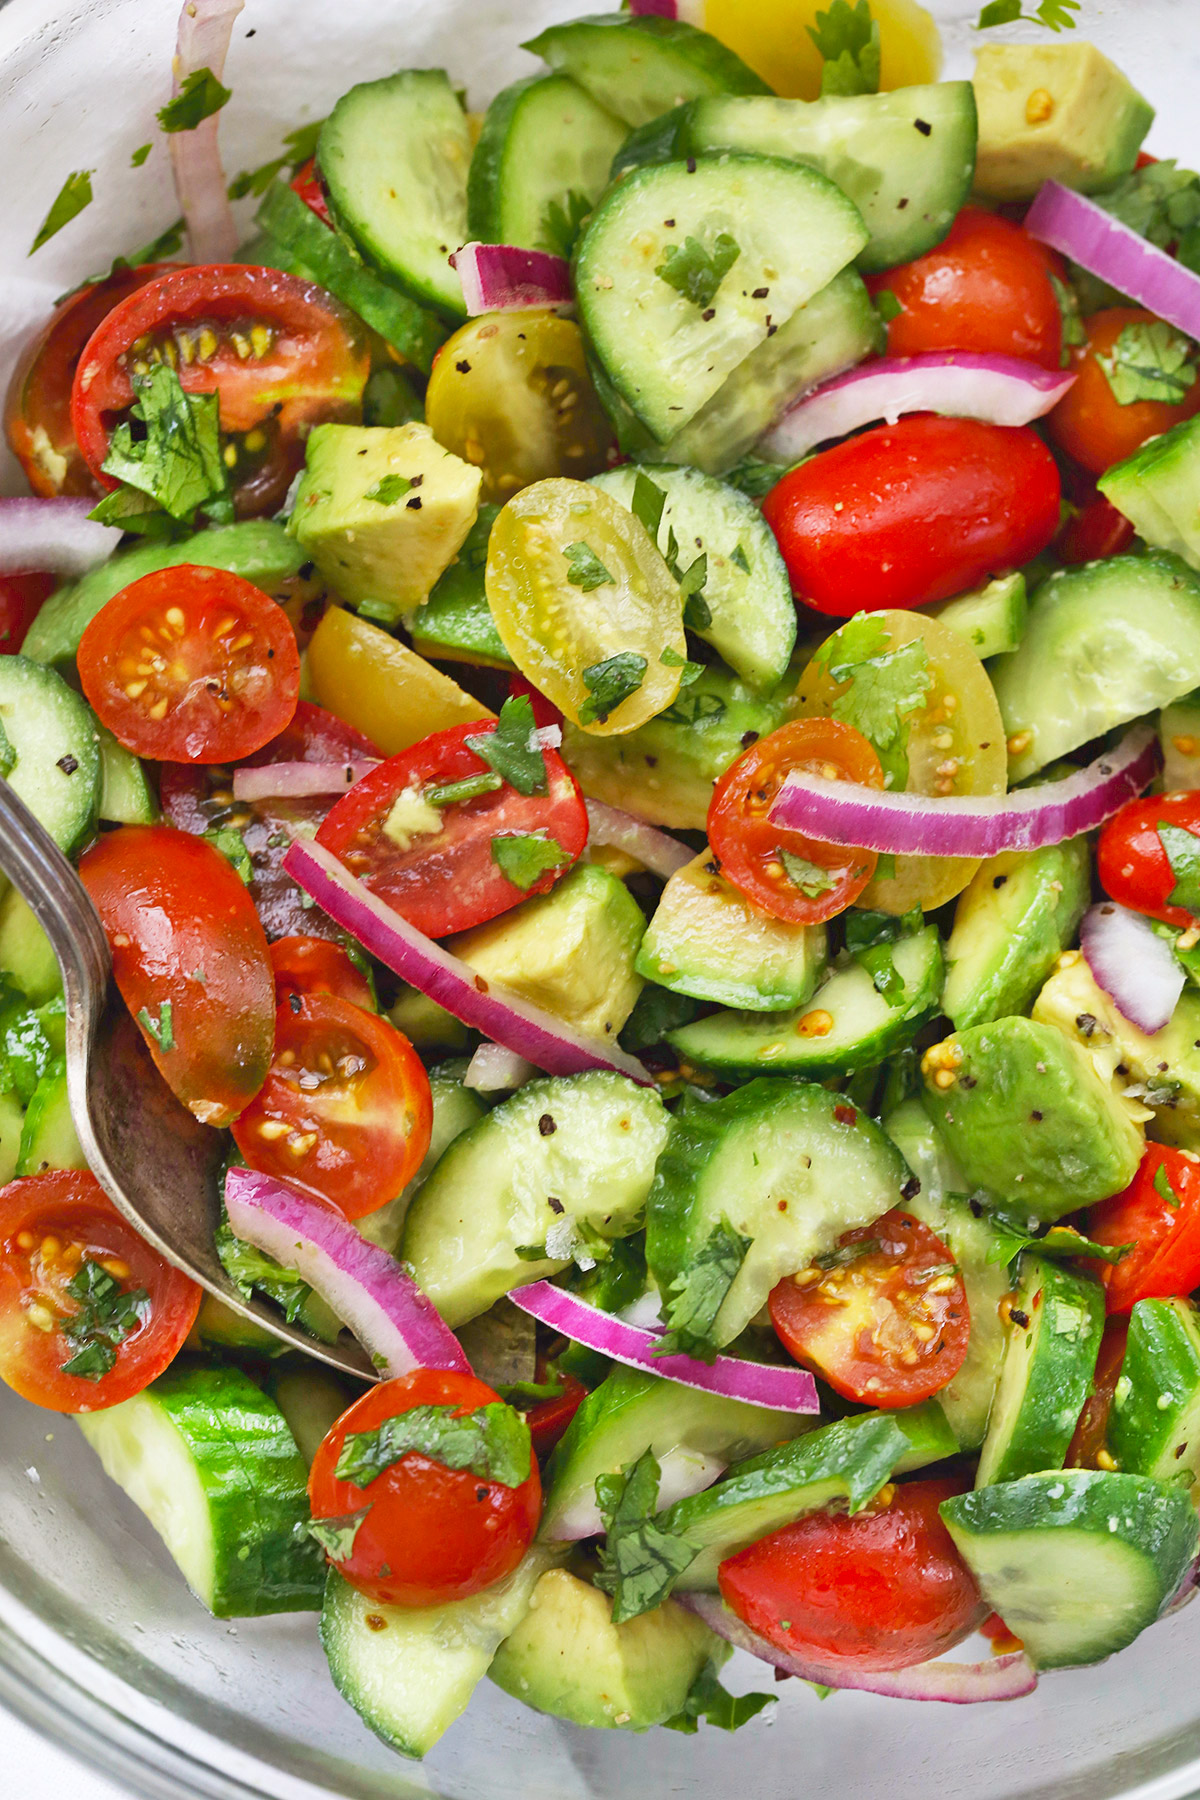 Close-up view of avocado cucumber tomato salad